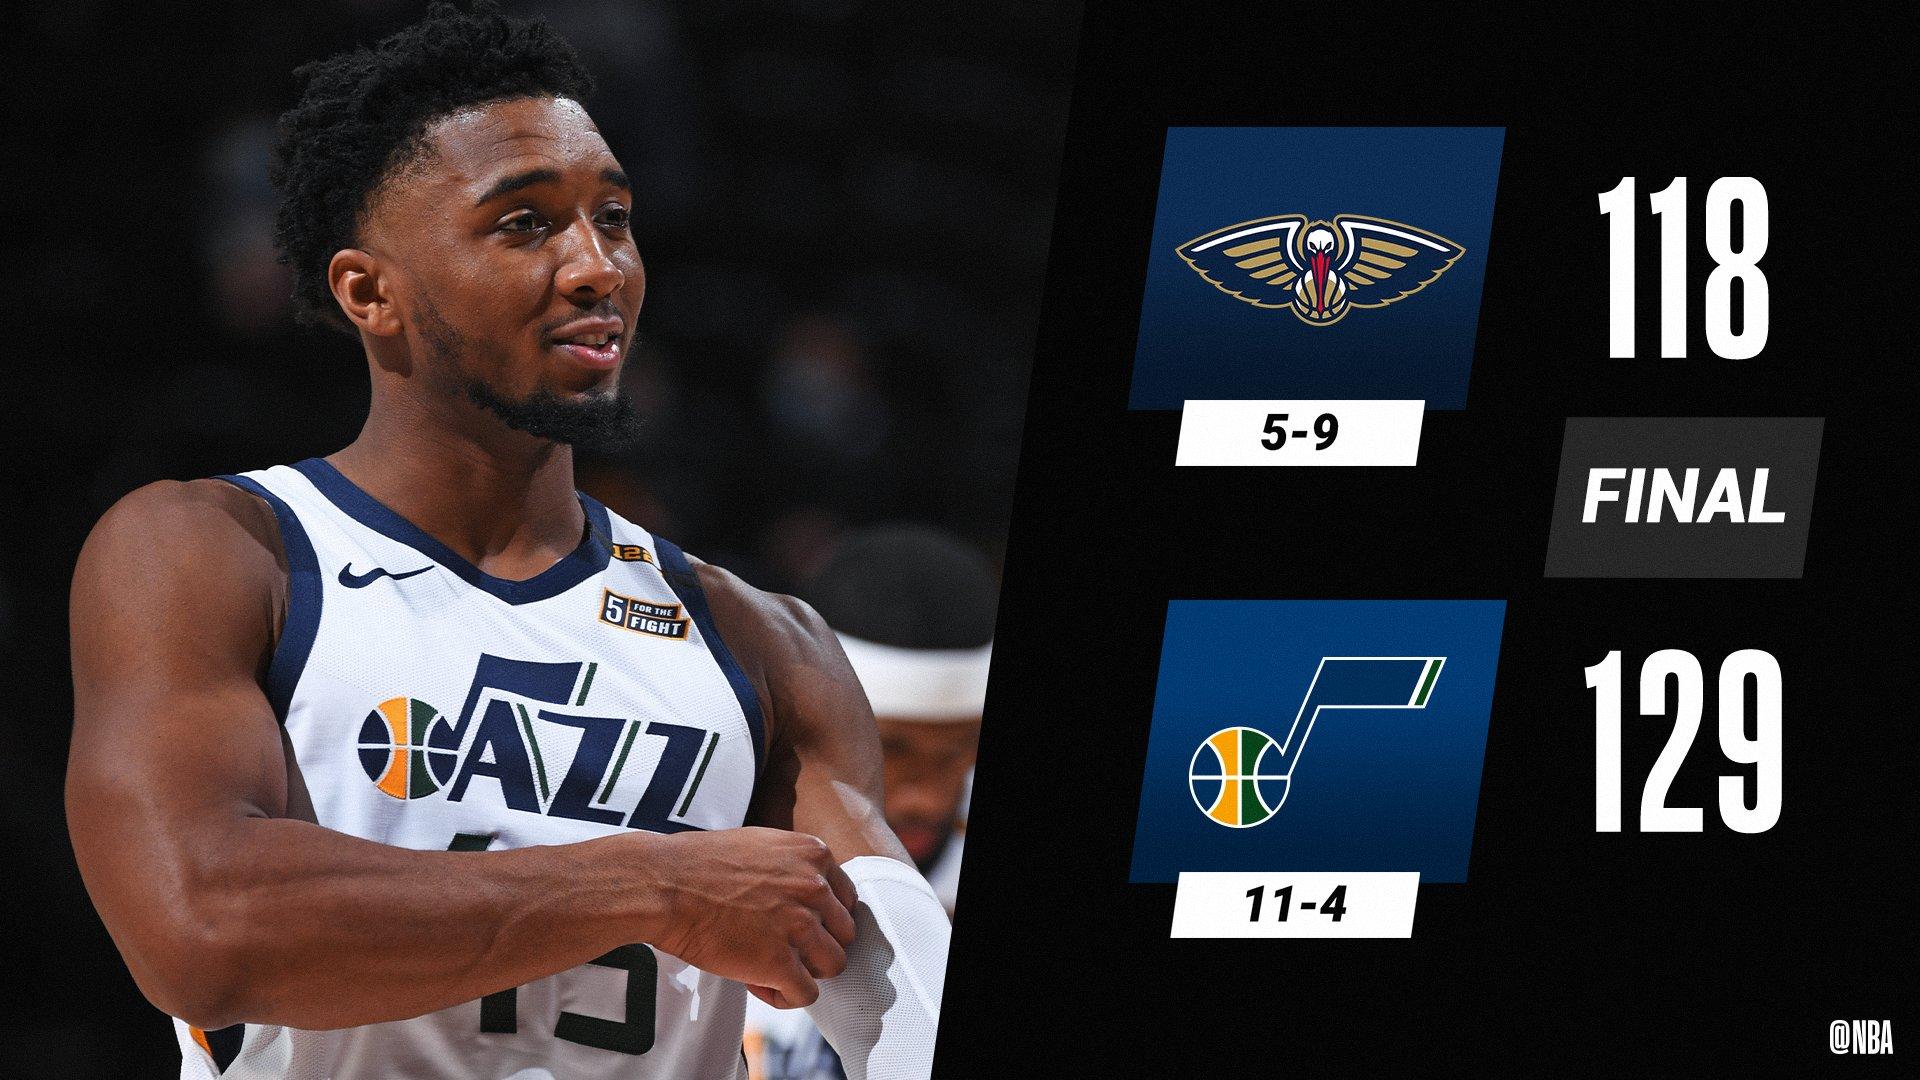 22-1-6